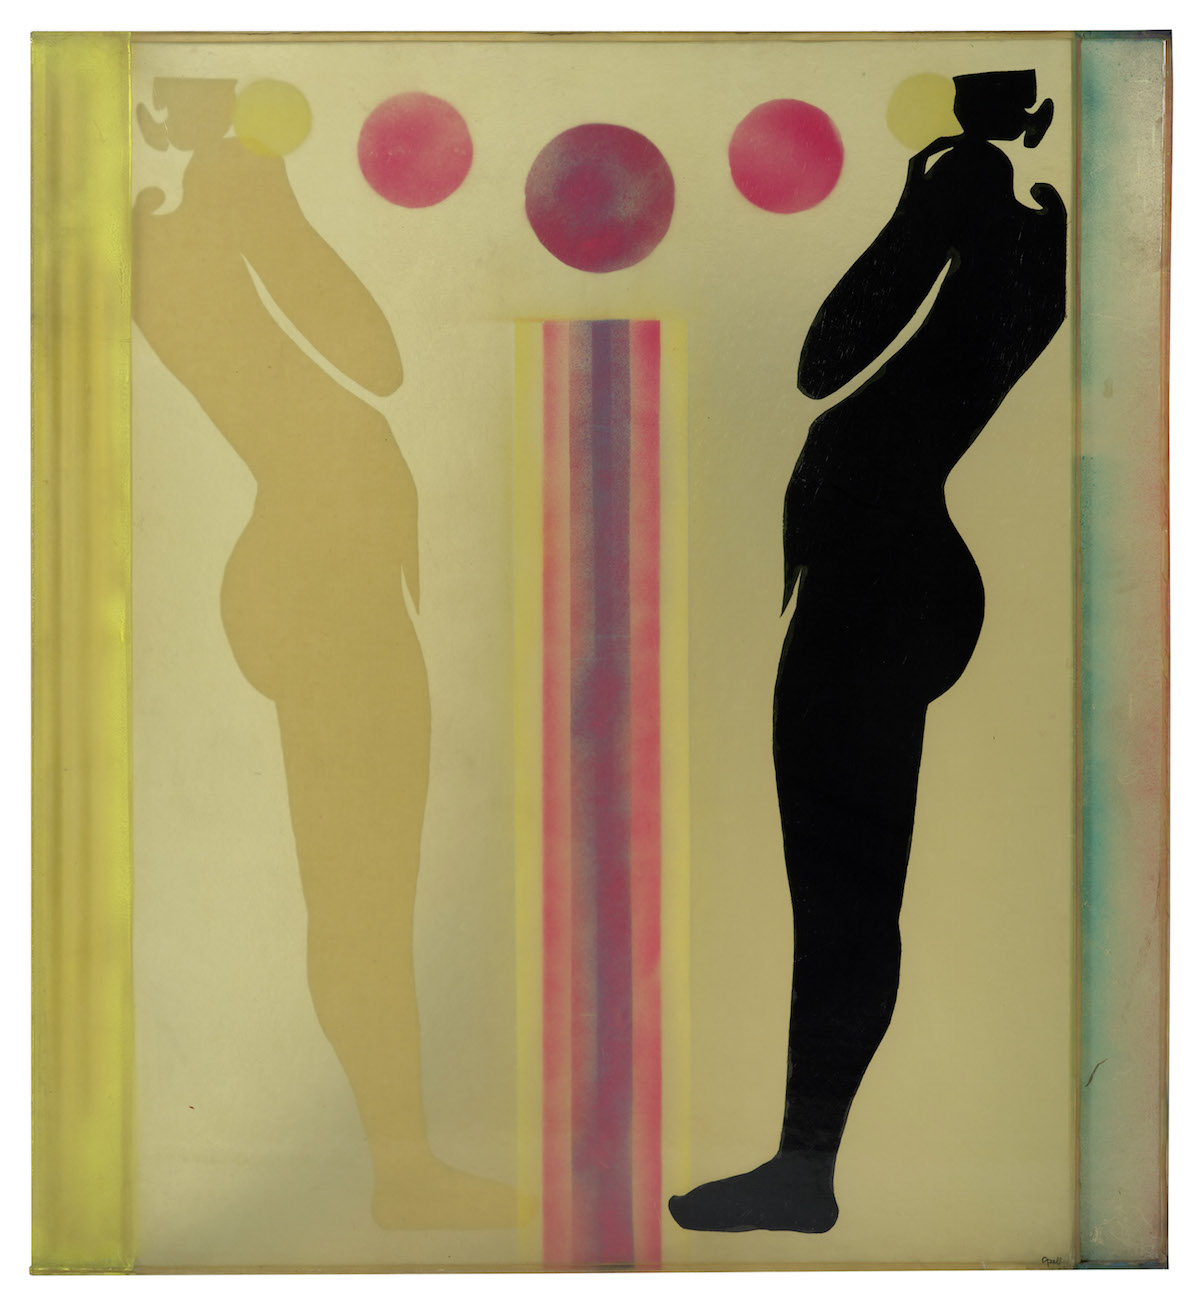 Evelyn Axell Konig Galerie Deux Femmes aux Bulles, 1967 Female Pop Artist